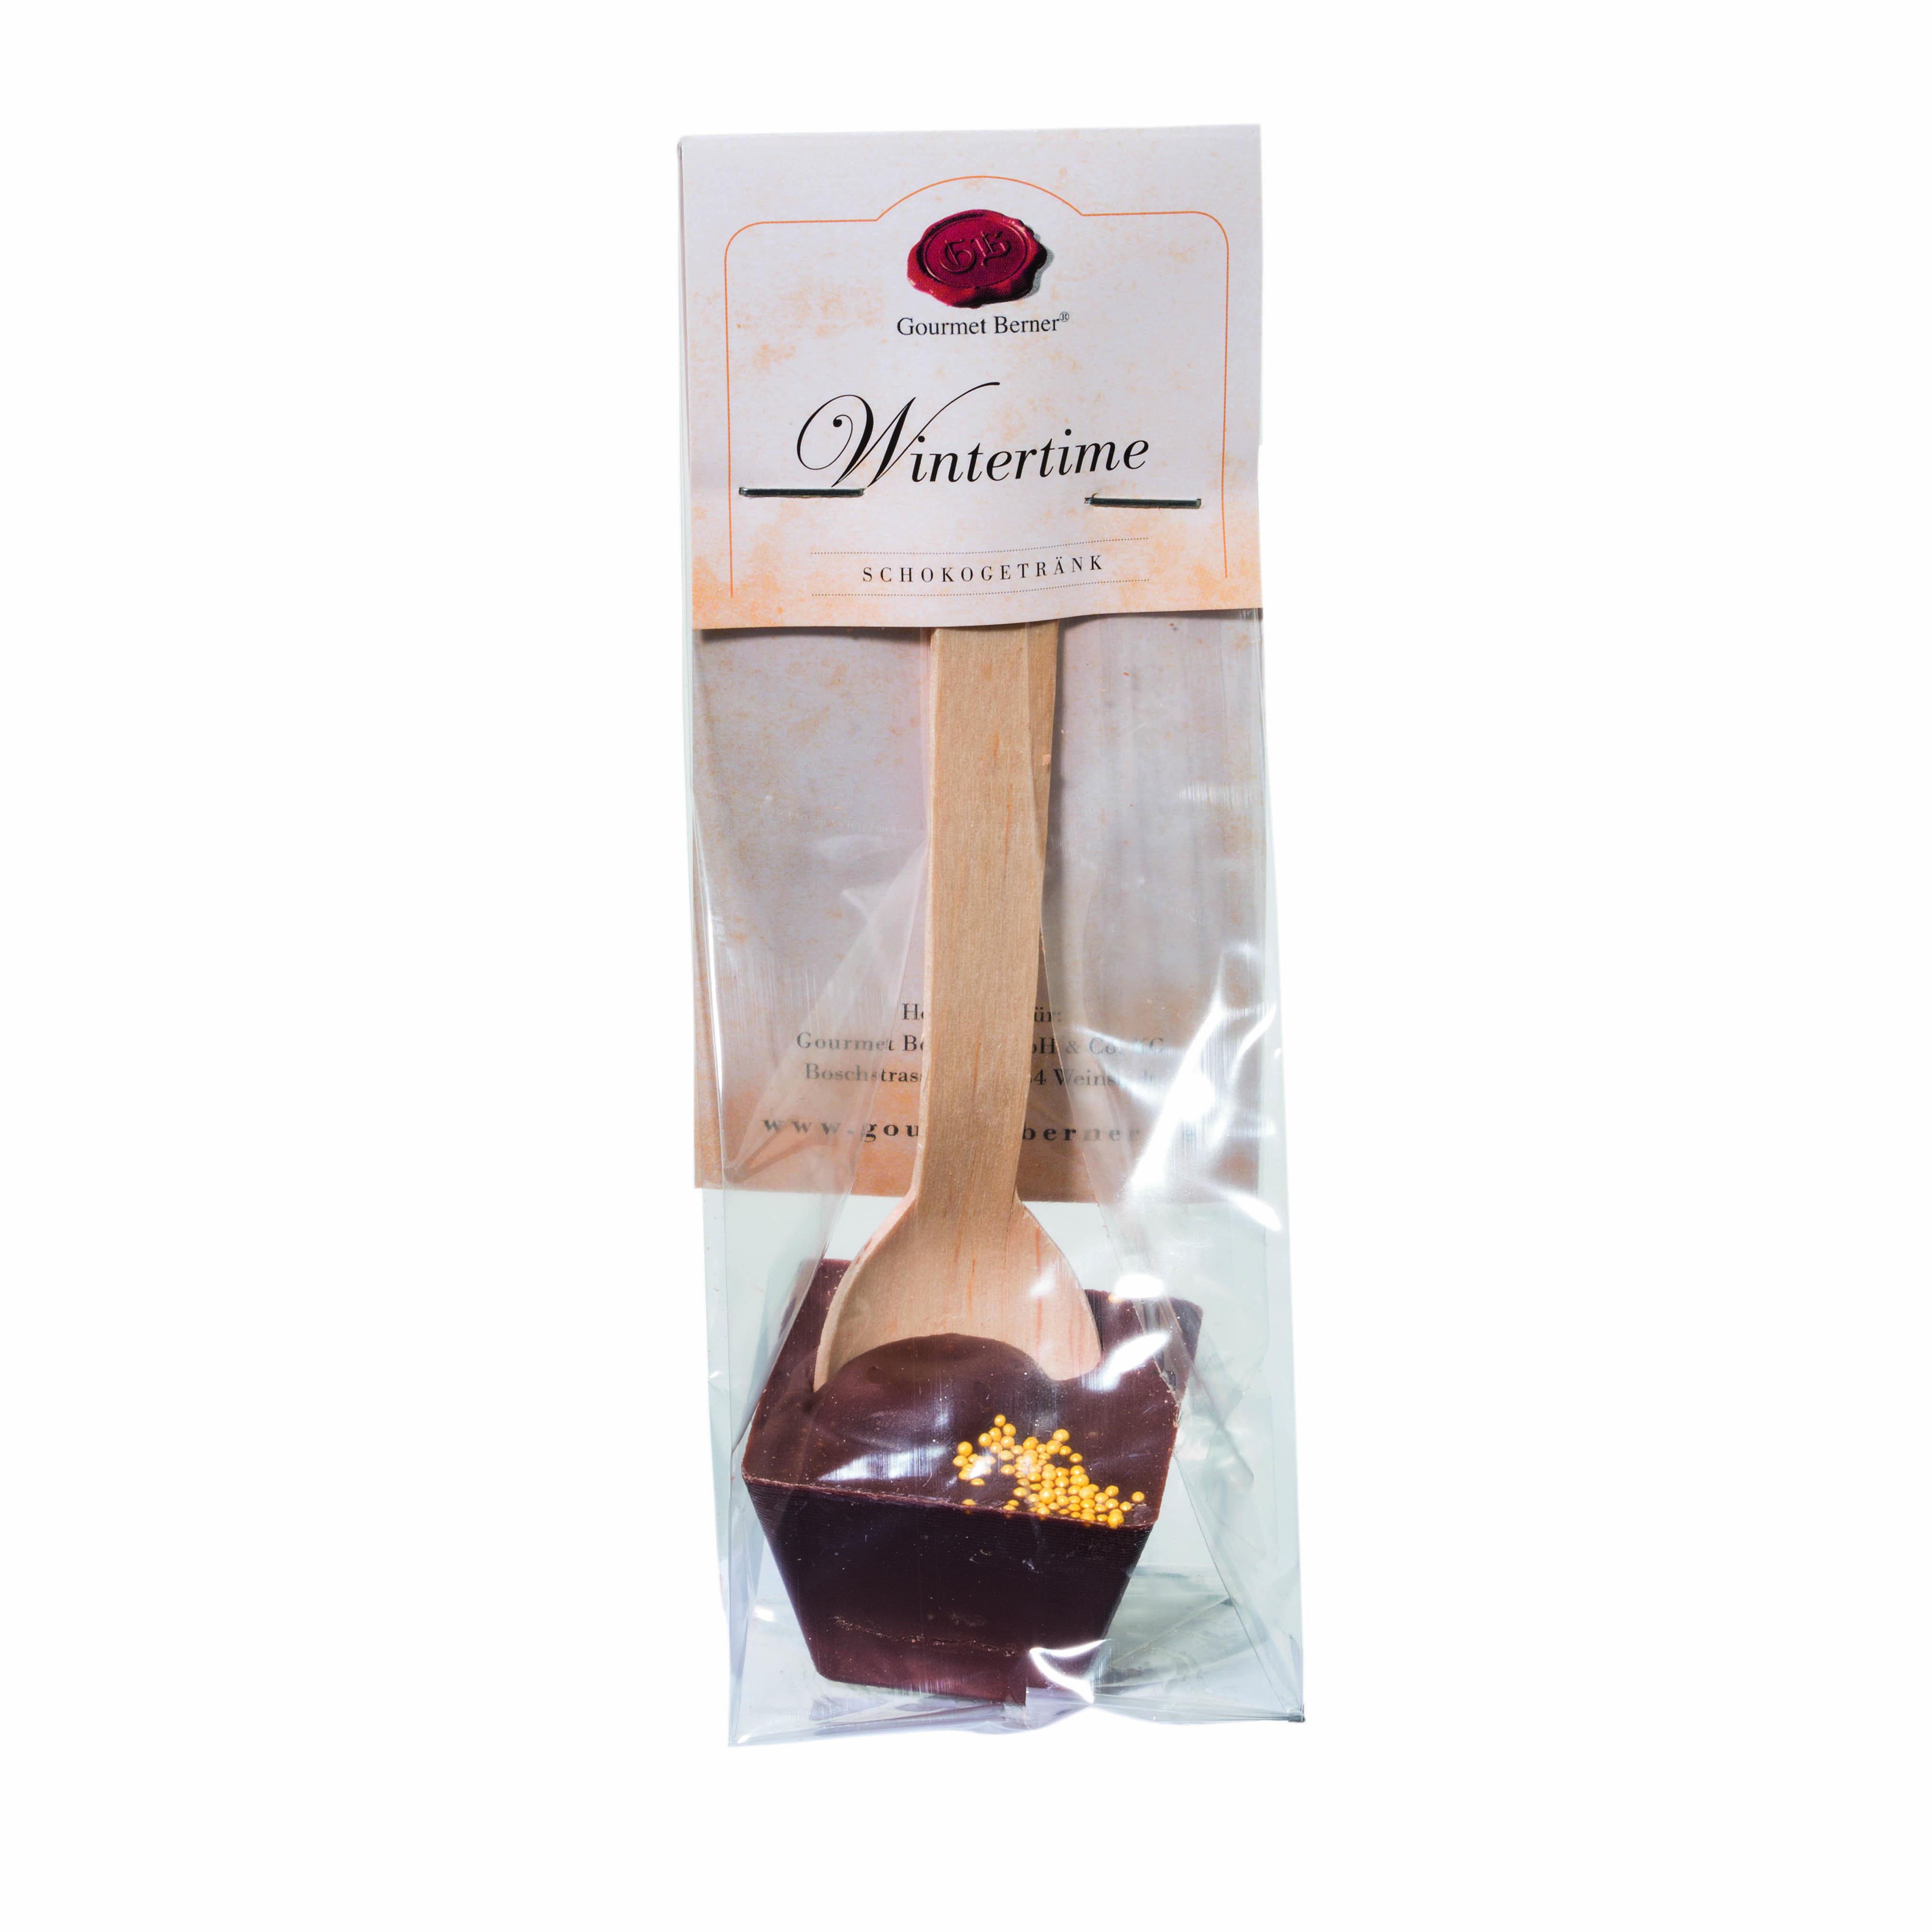 "Trinkschokolade ""Wintertime"" - Gourmet Berner"